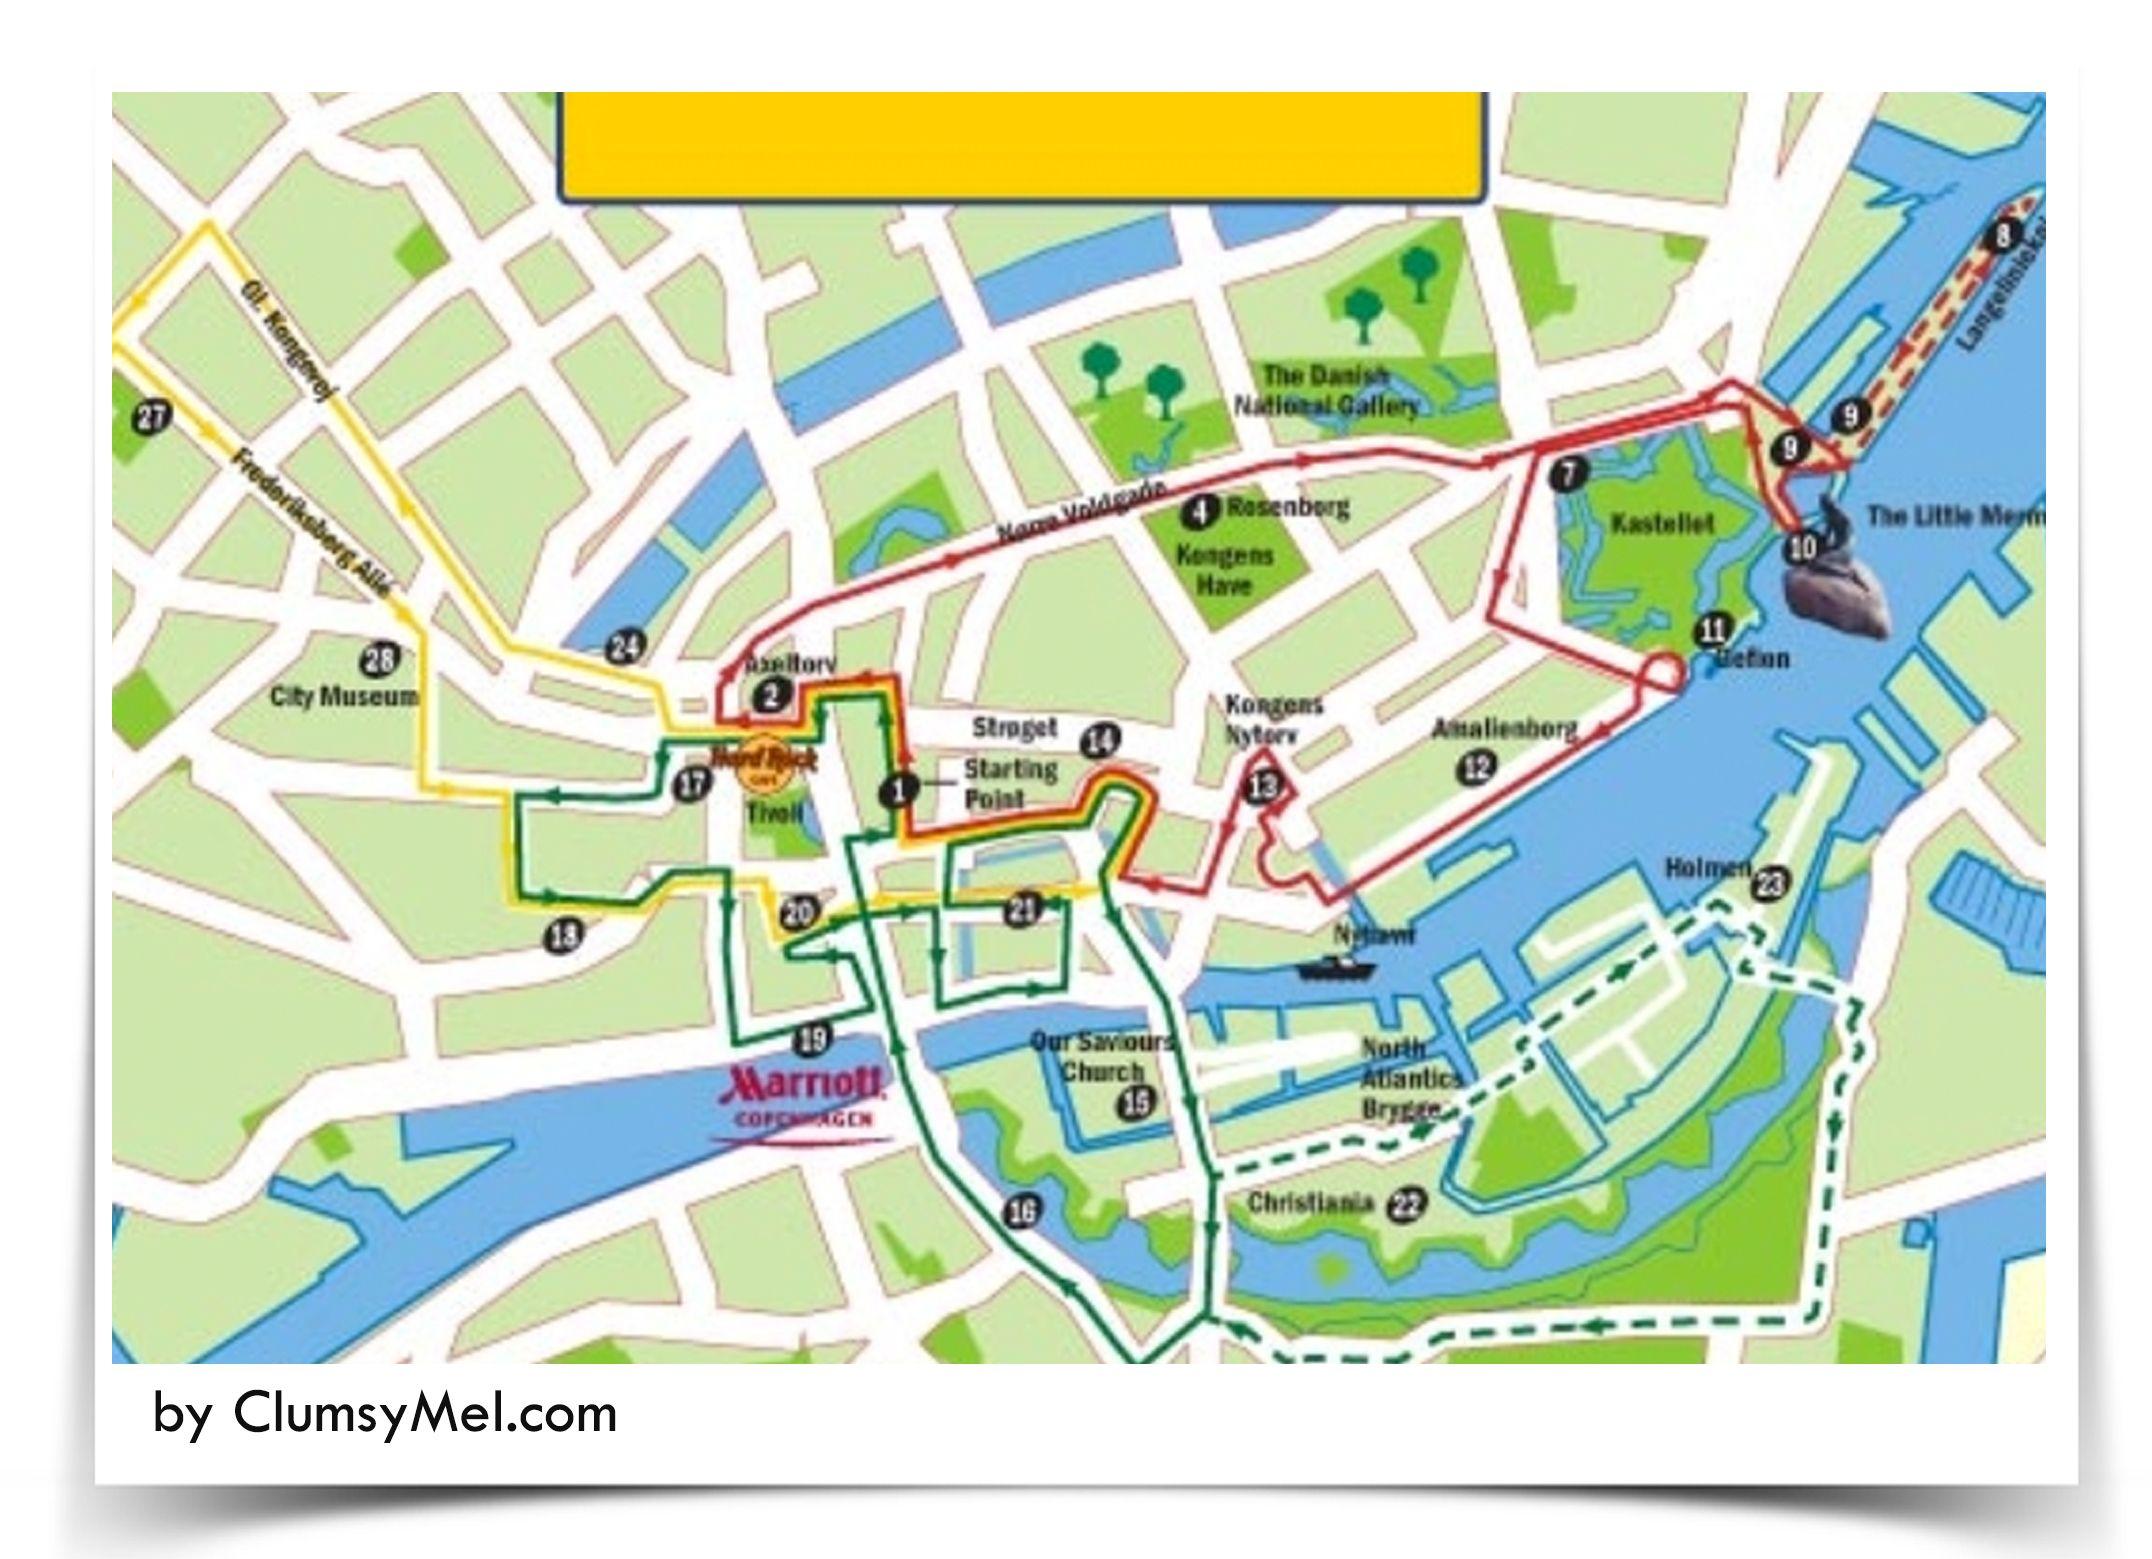 Copenhagen city tour map walking tour denmark Maps Clocks